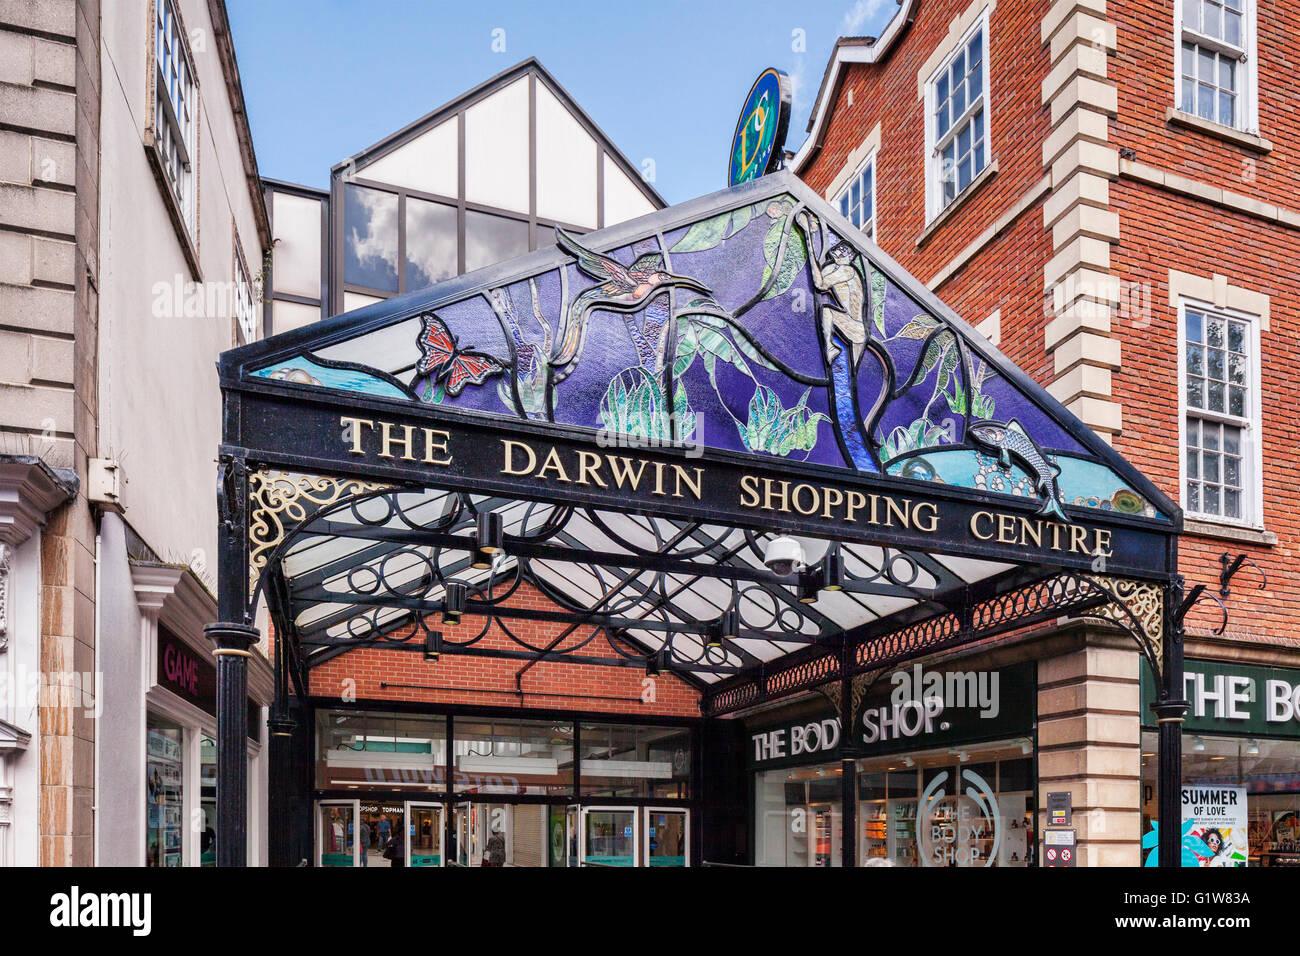 The Darwin Shopping Centre, Shrewsbury, Shropshire, England, UK - Stock Image